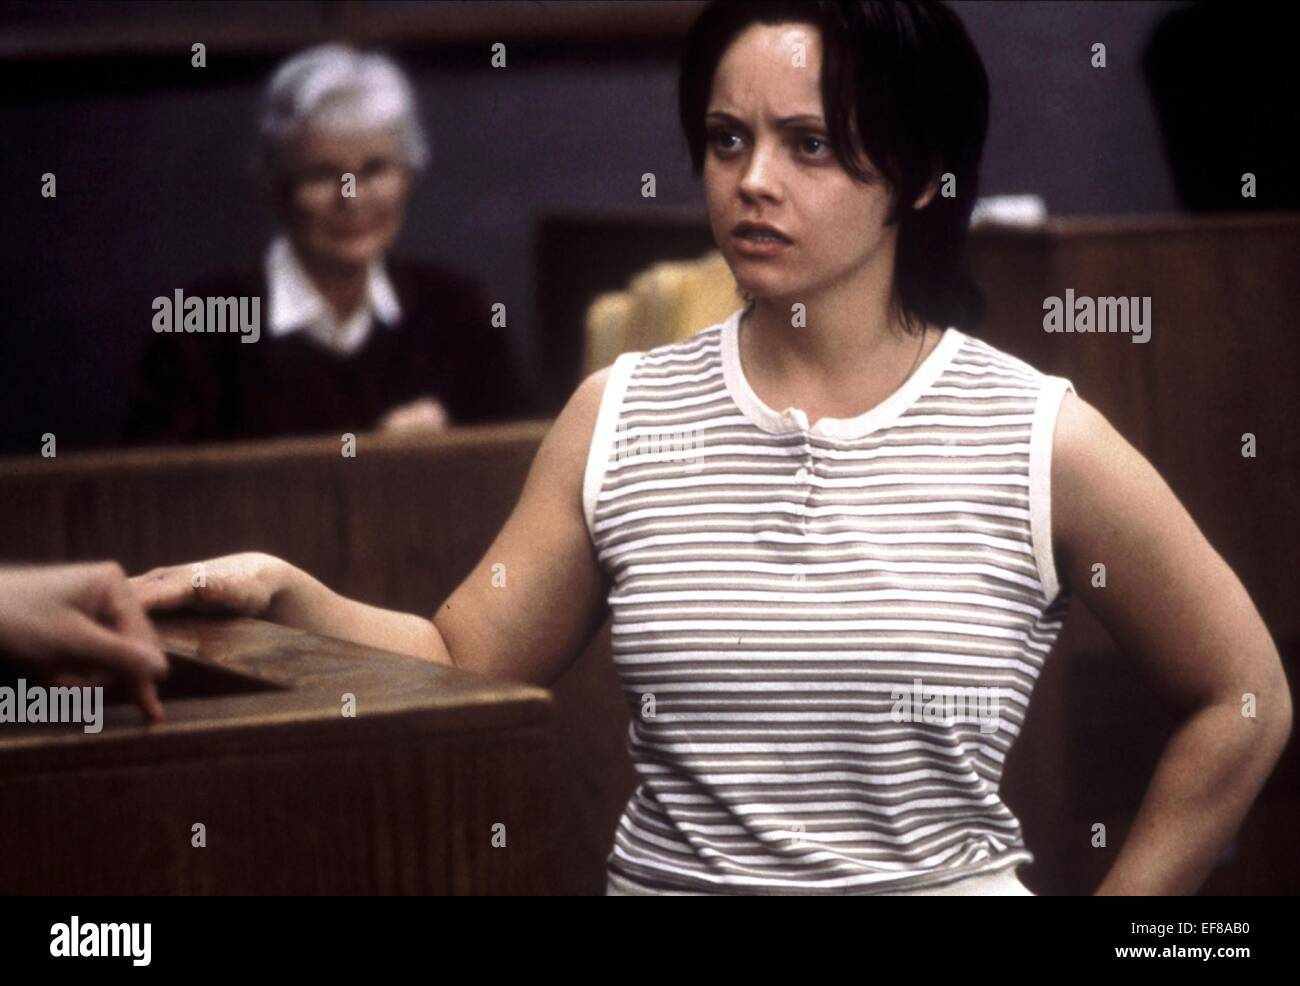 Discussion on this topic: Dasha astafieva totally shows her nipples, christina-ricci-la-premiere-of-monster-nov/